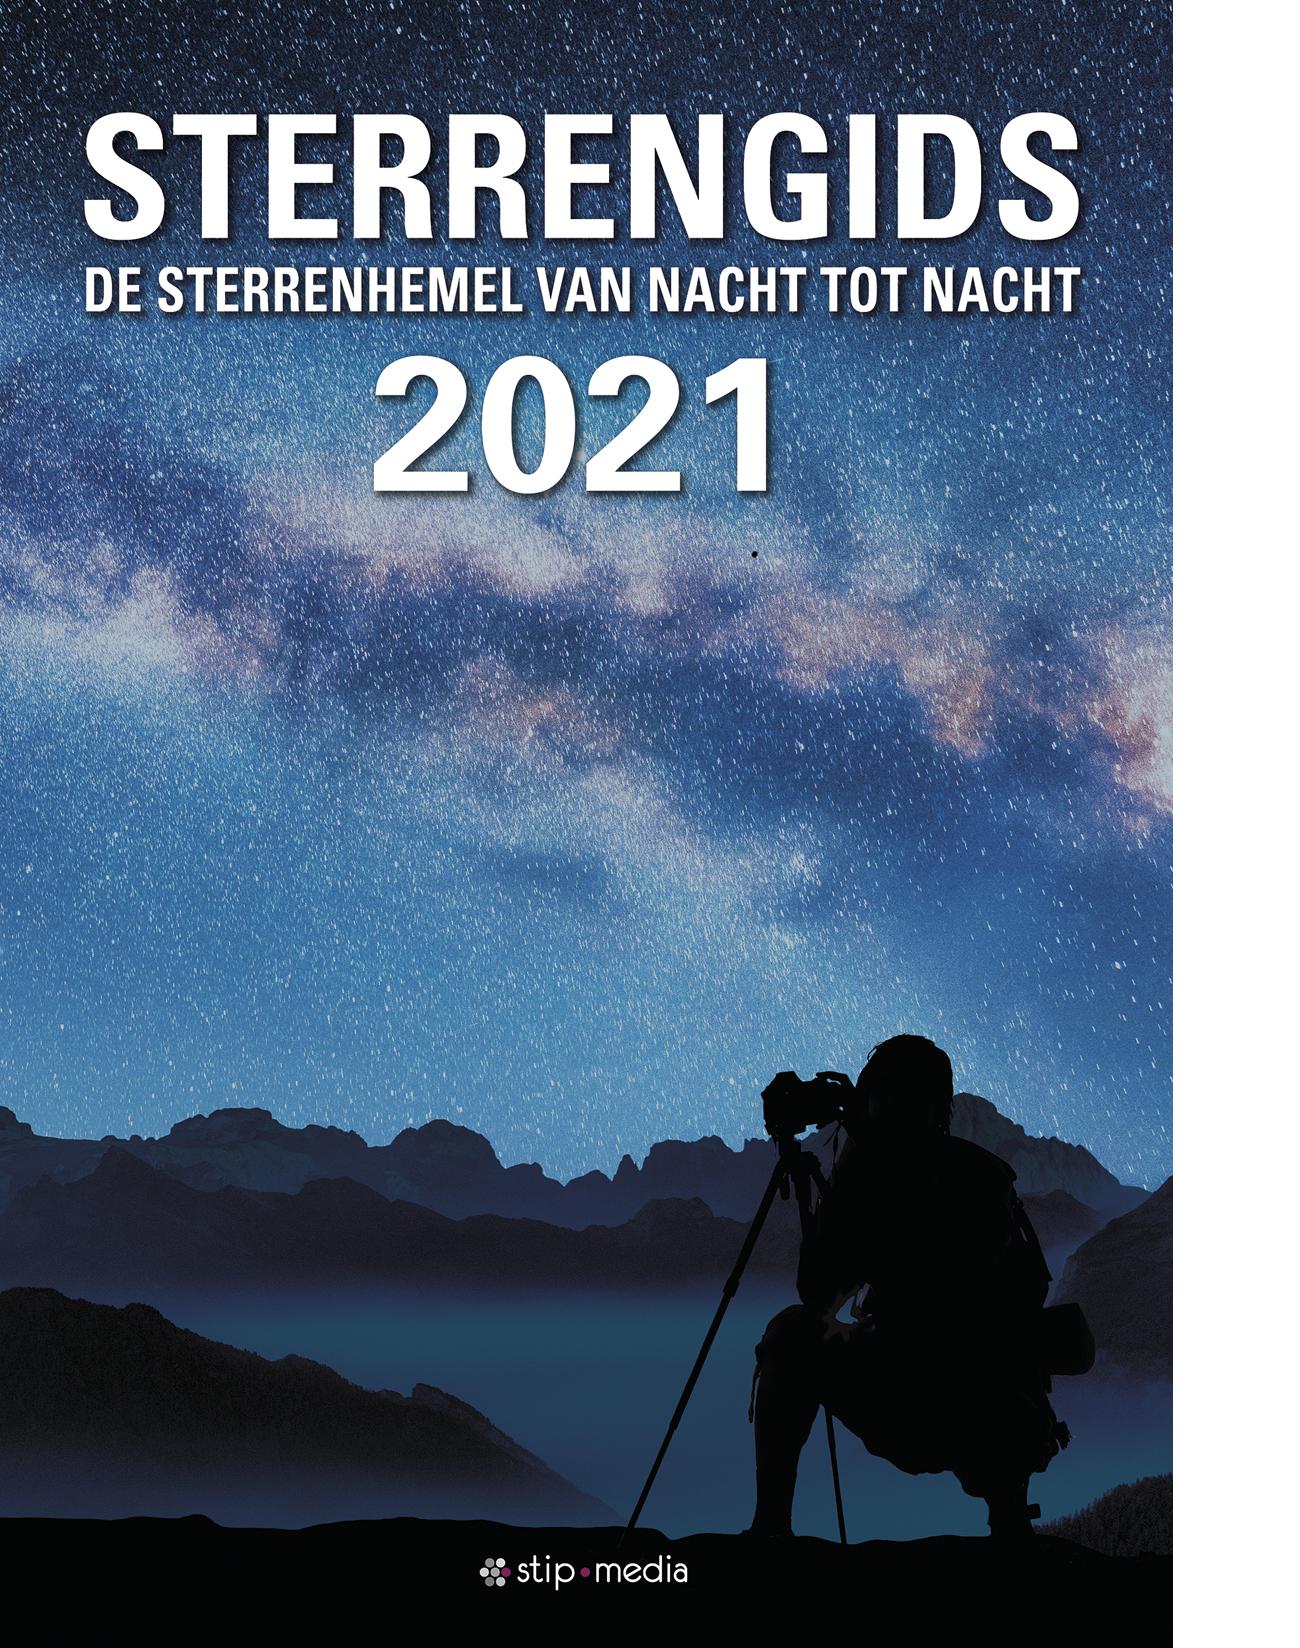 Sterrengids 2021